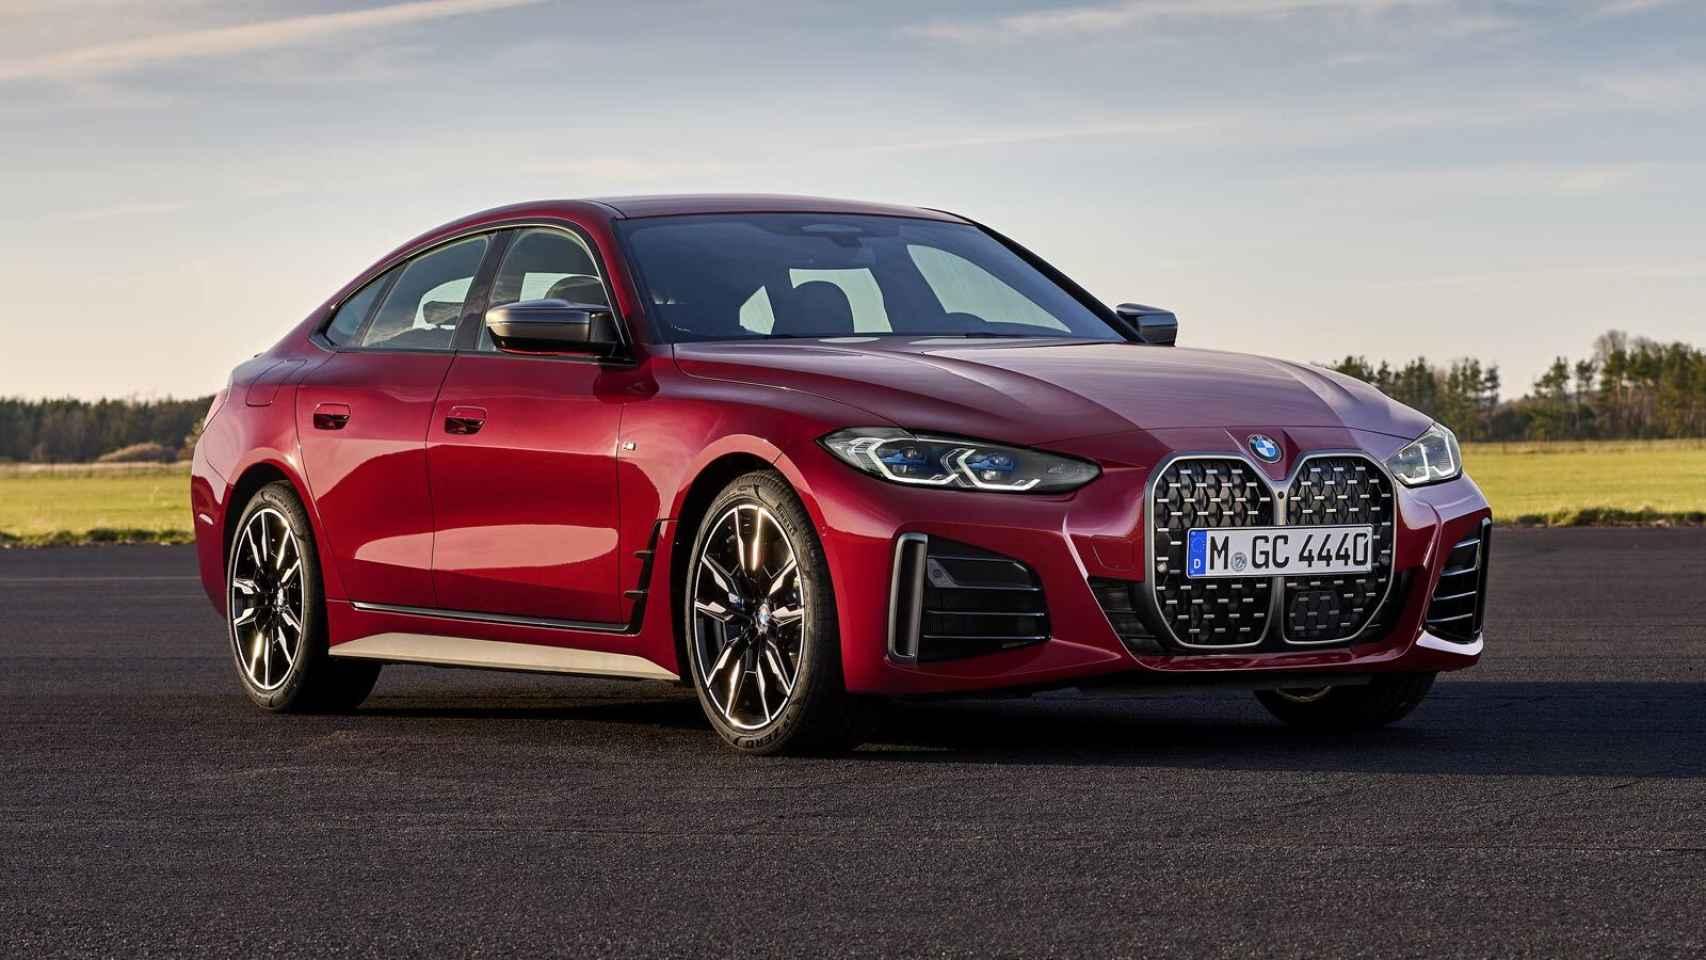 BMW Serie 4 Gran Coupé: nuevo rival para el Audi A5 Sportback y Mercedes CLA Coupé